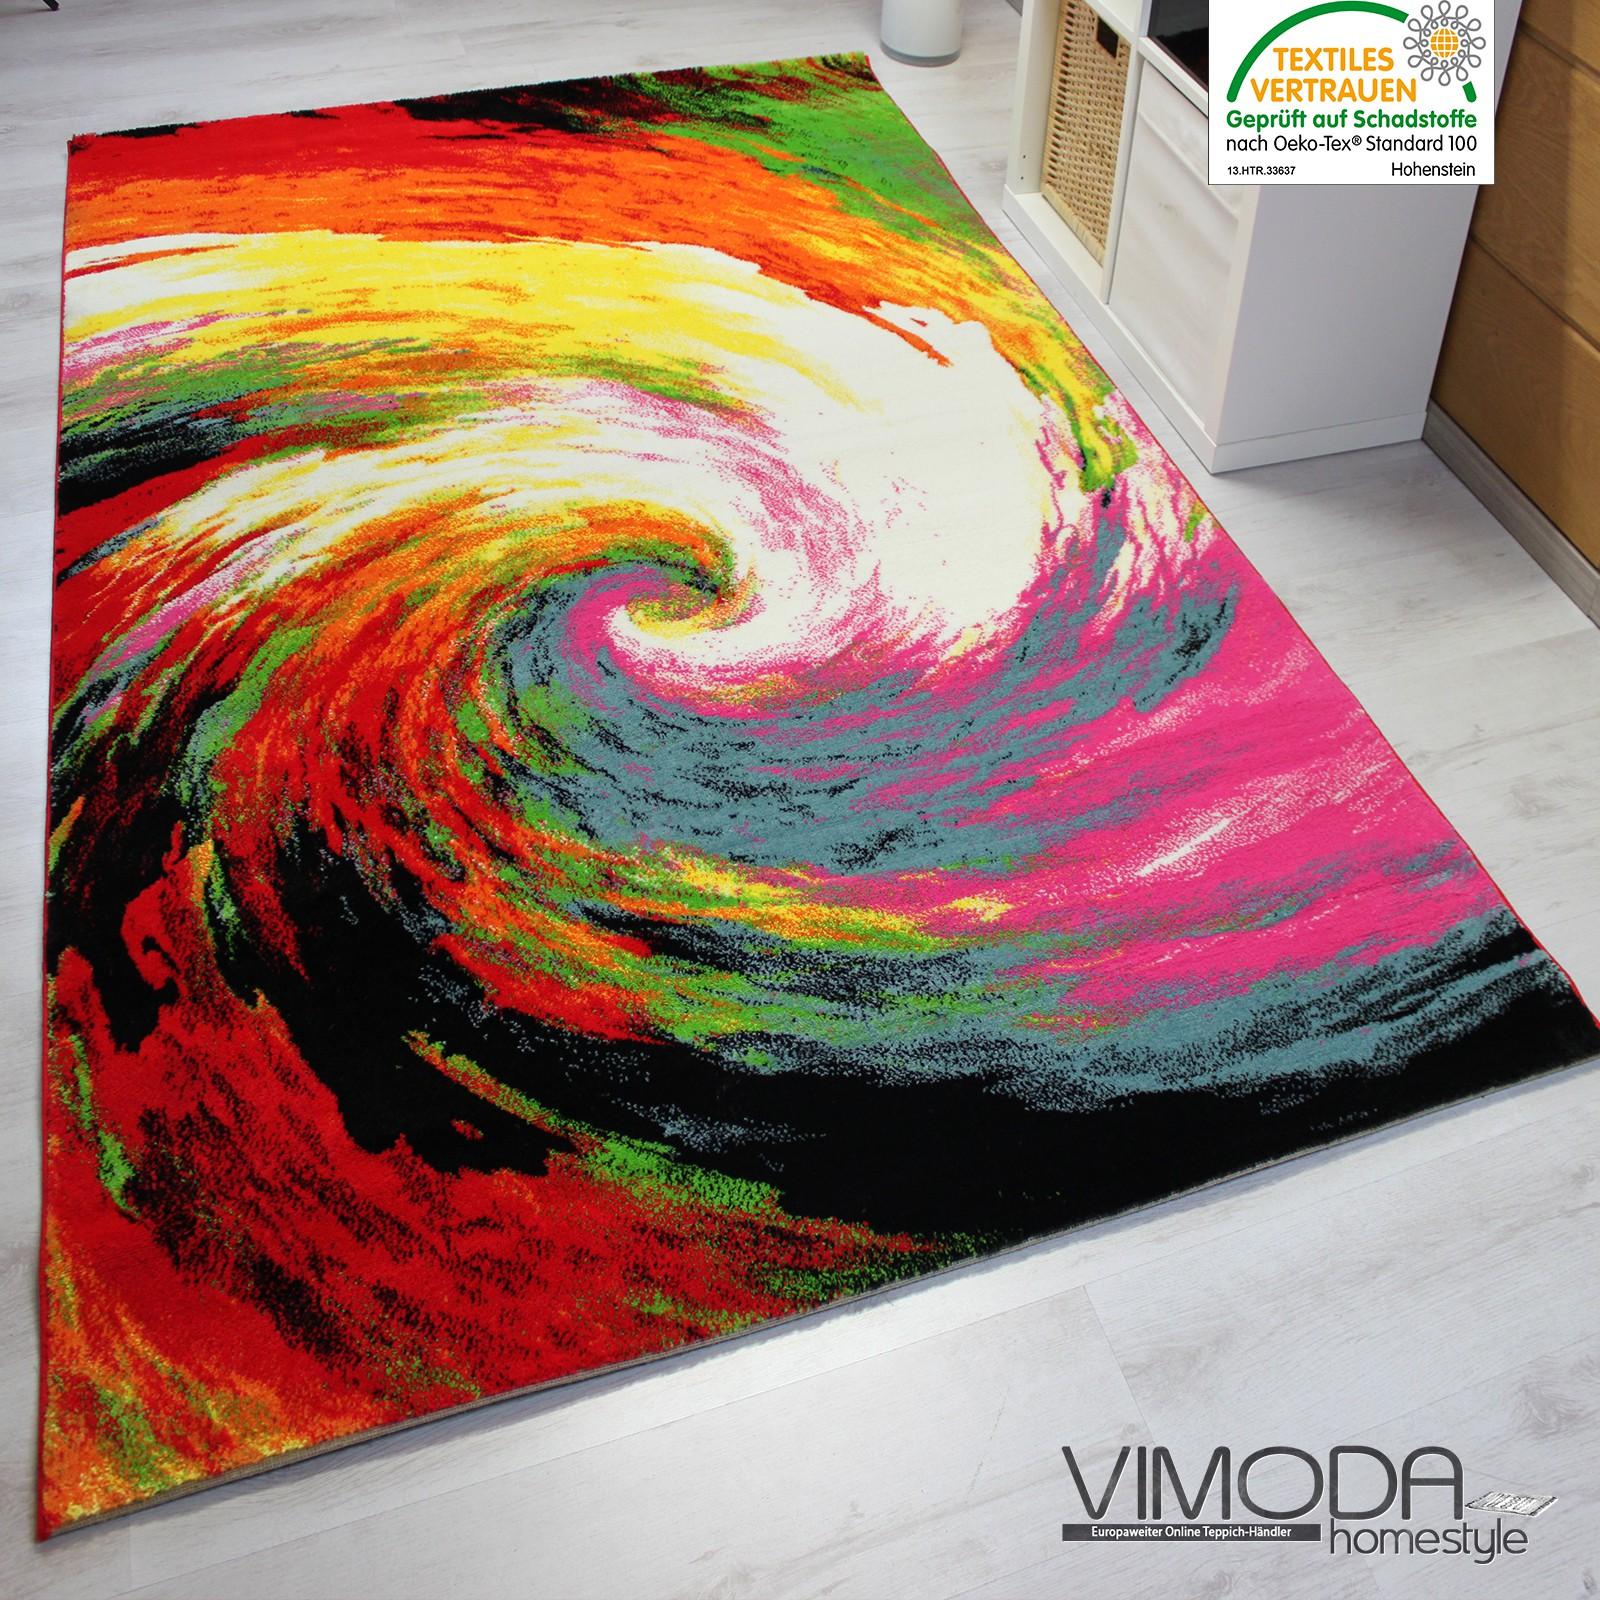 teppich modern design kurzflor multicolor kreis wirbel in rot gr n gelb f7776. Black Bedroom Furniture Sets. Home Design Ideas